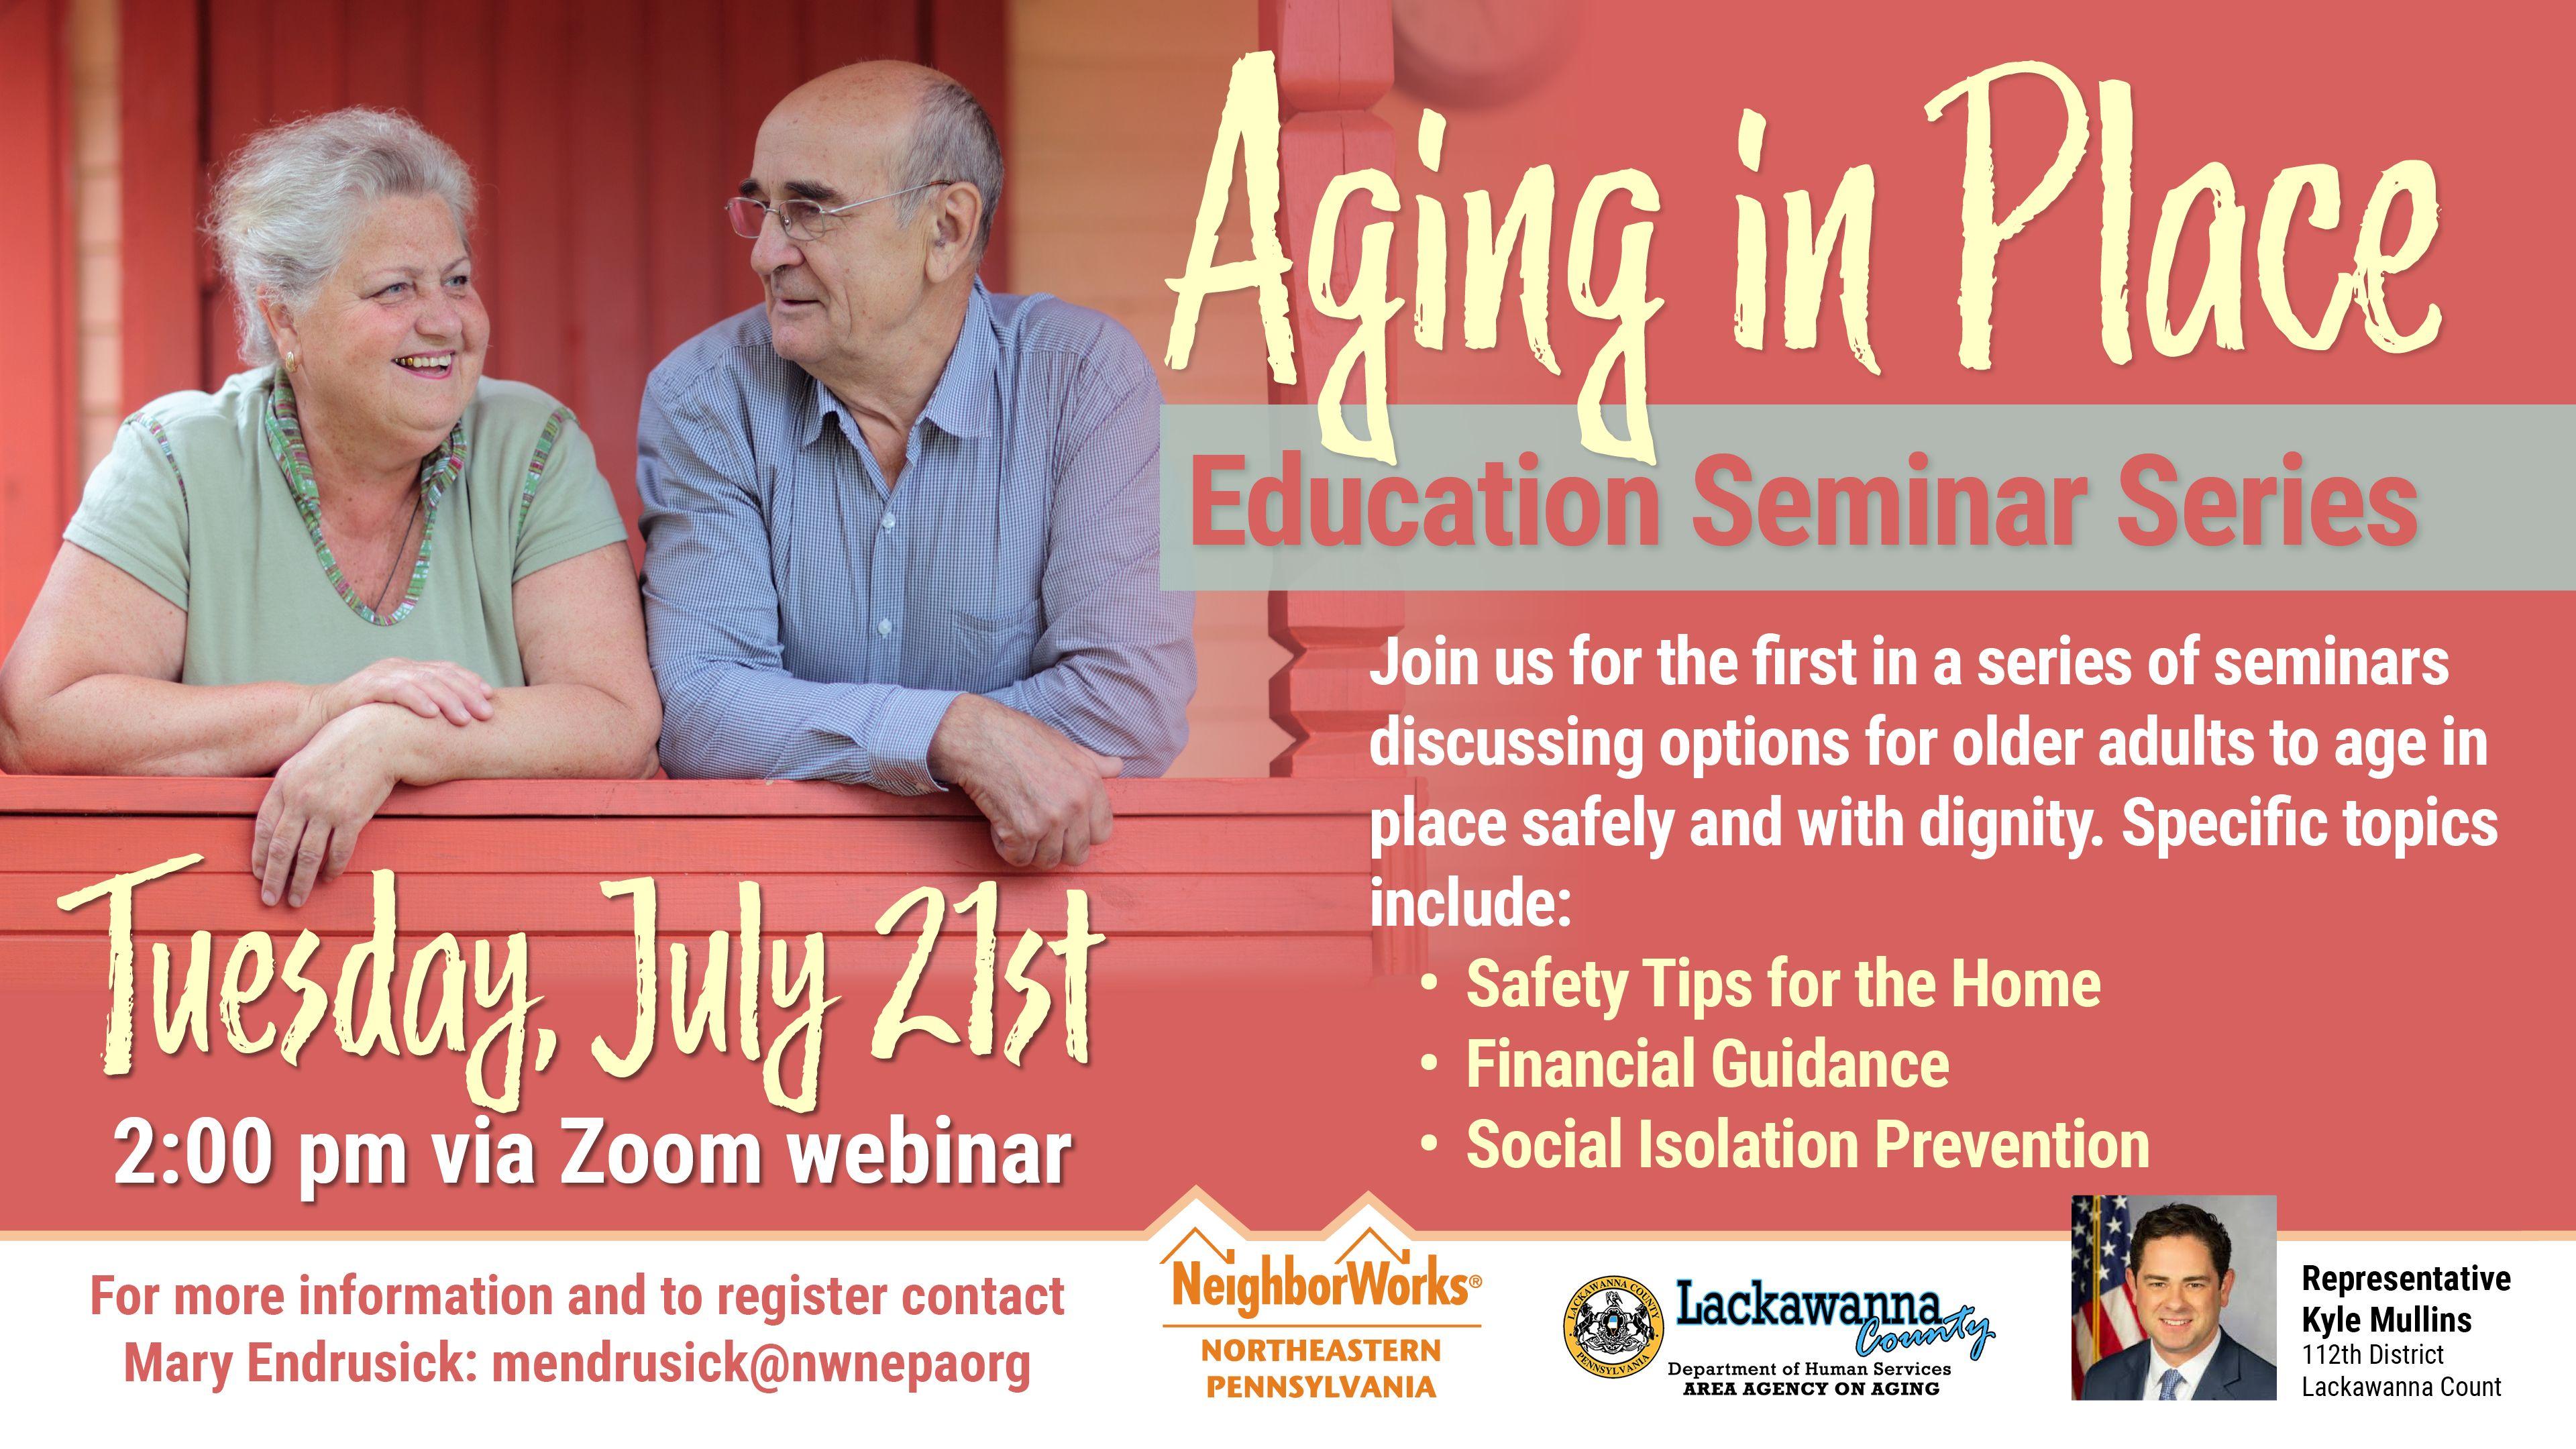 NeighborWorks NEPA offering virtual Aging in Place Educational Seminars